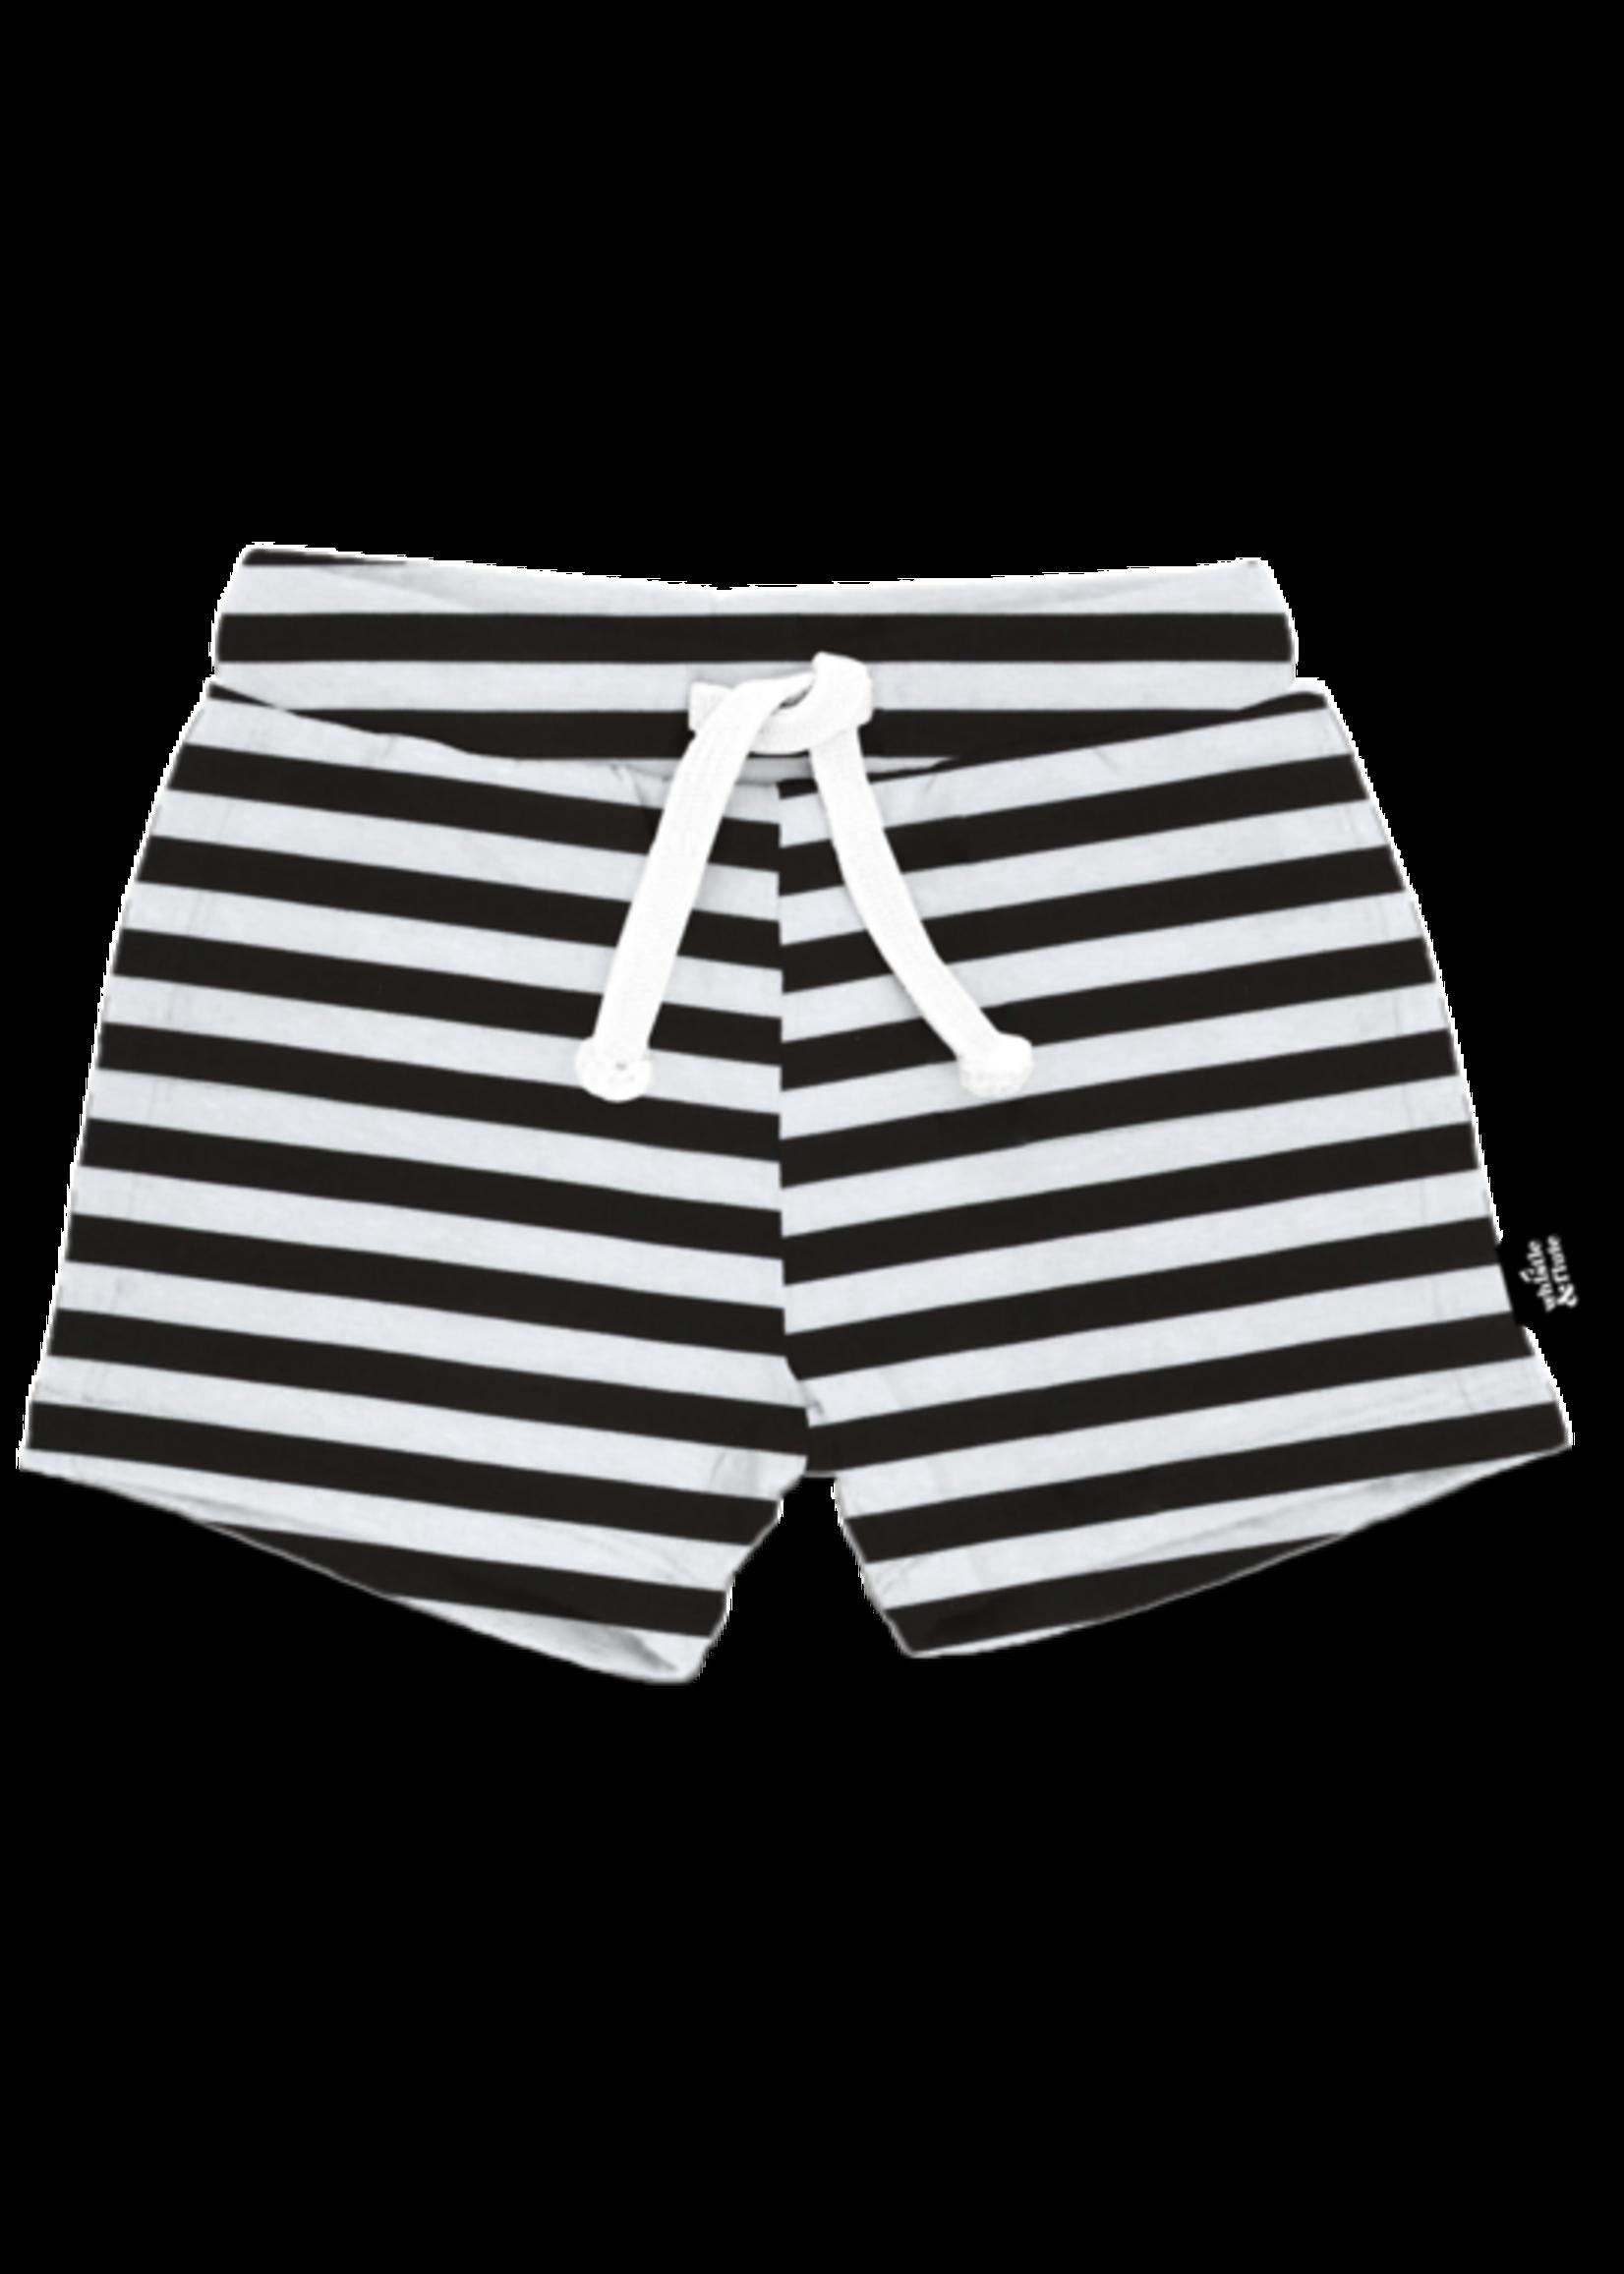 Whistle & Flute Whistle & Flute Drawstring Shorts (Striped)